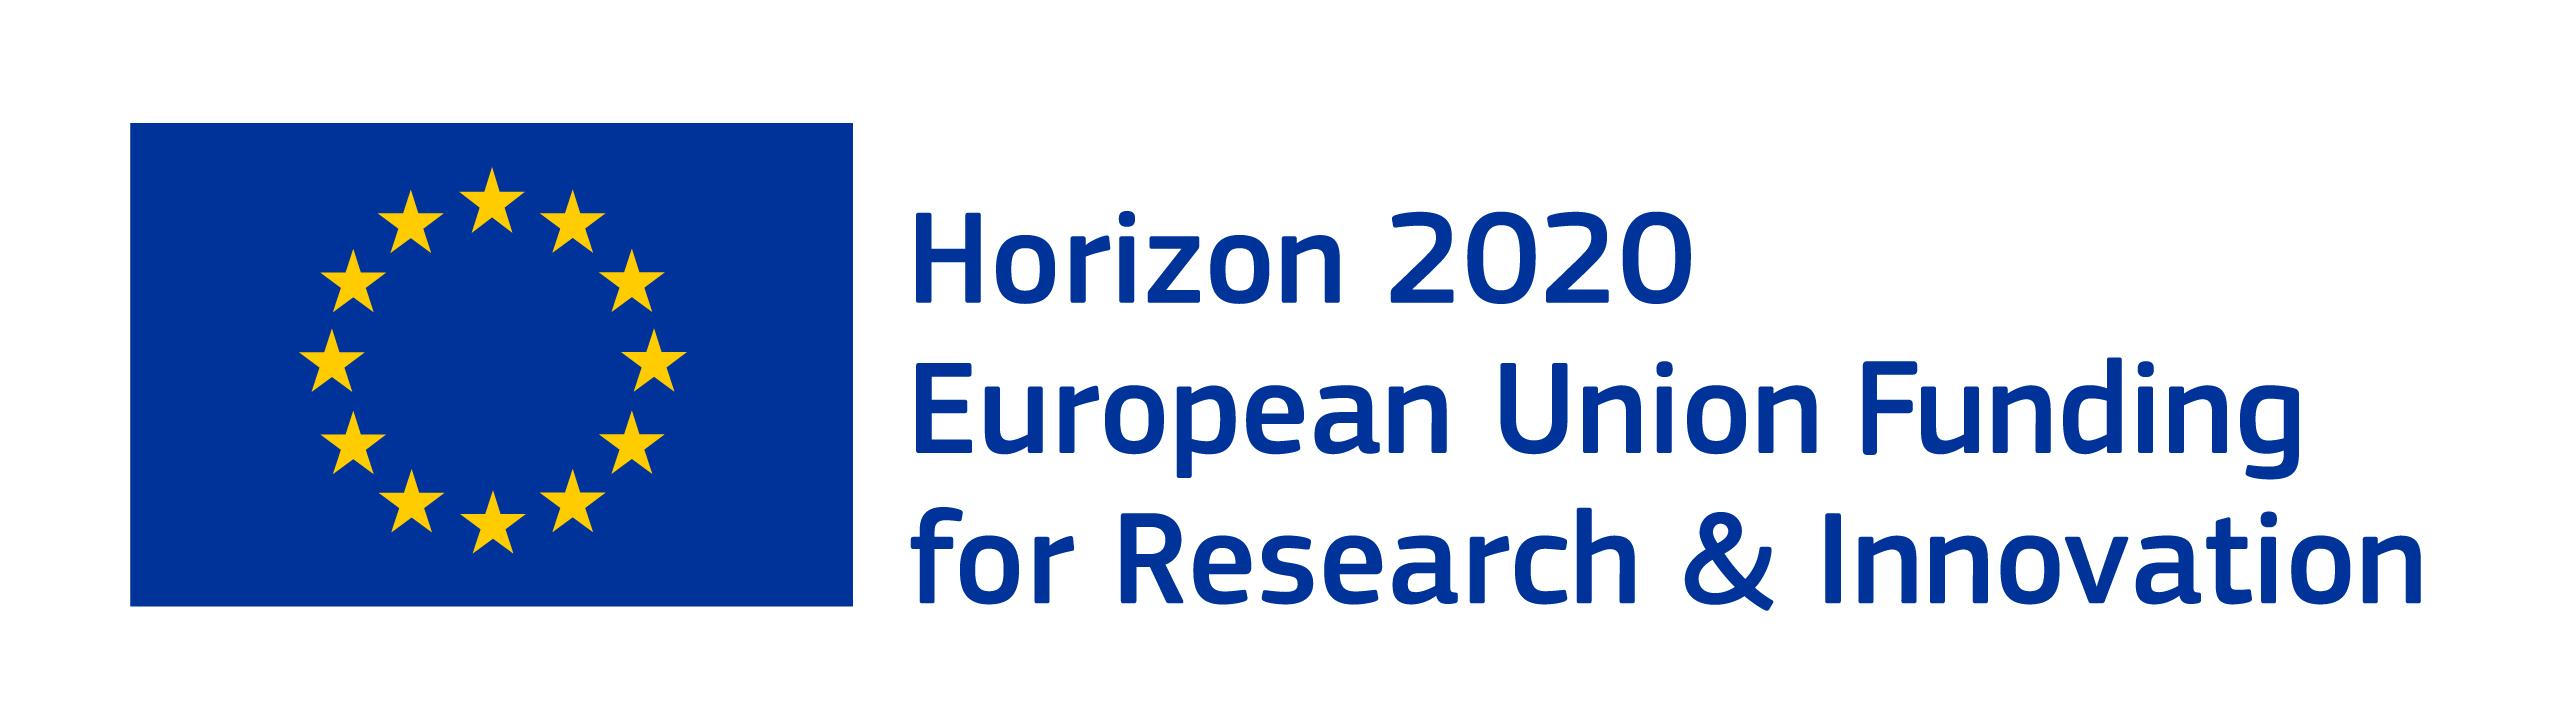 Iafp Europe 2020